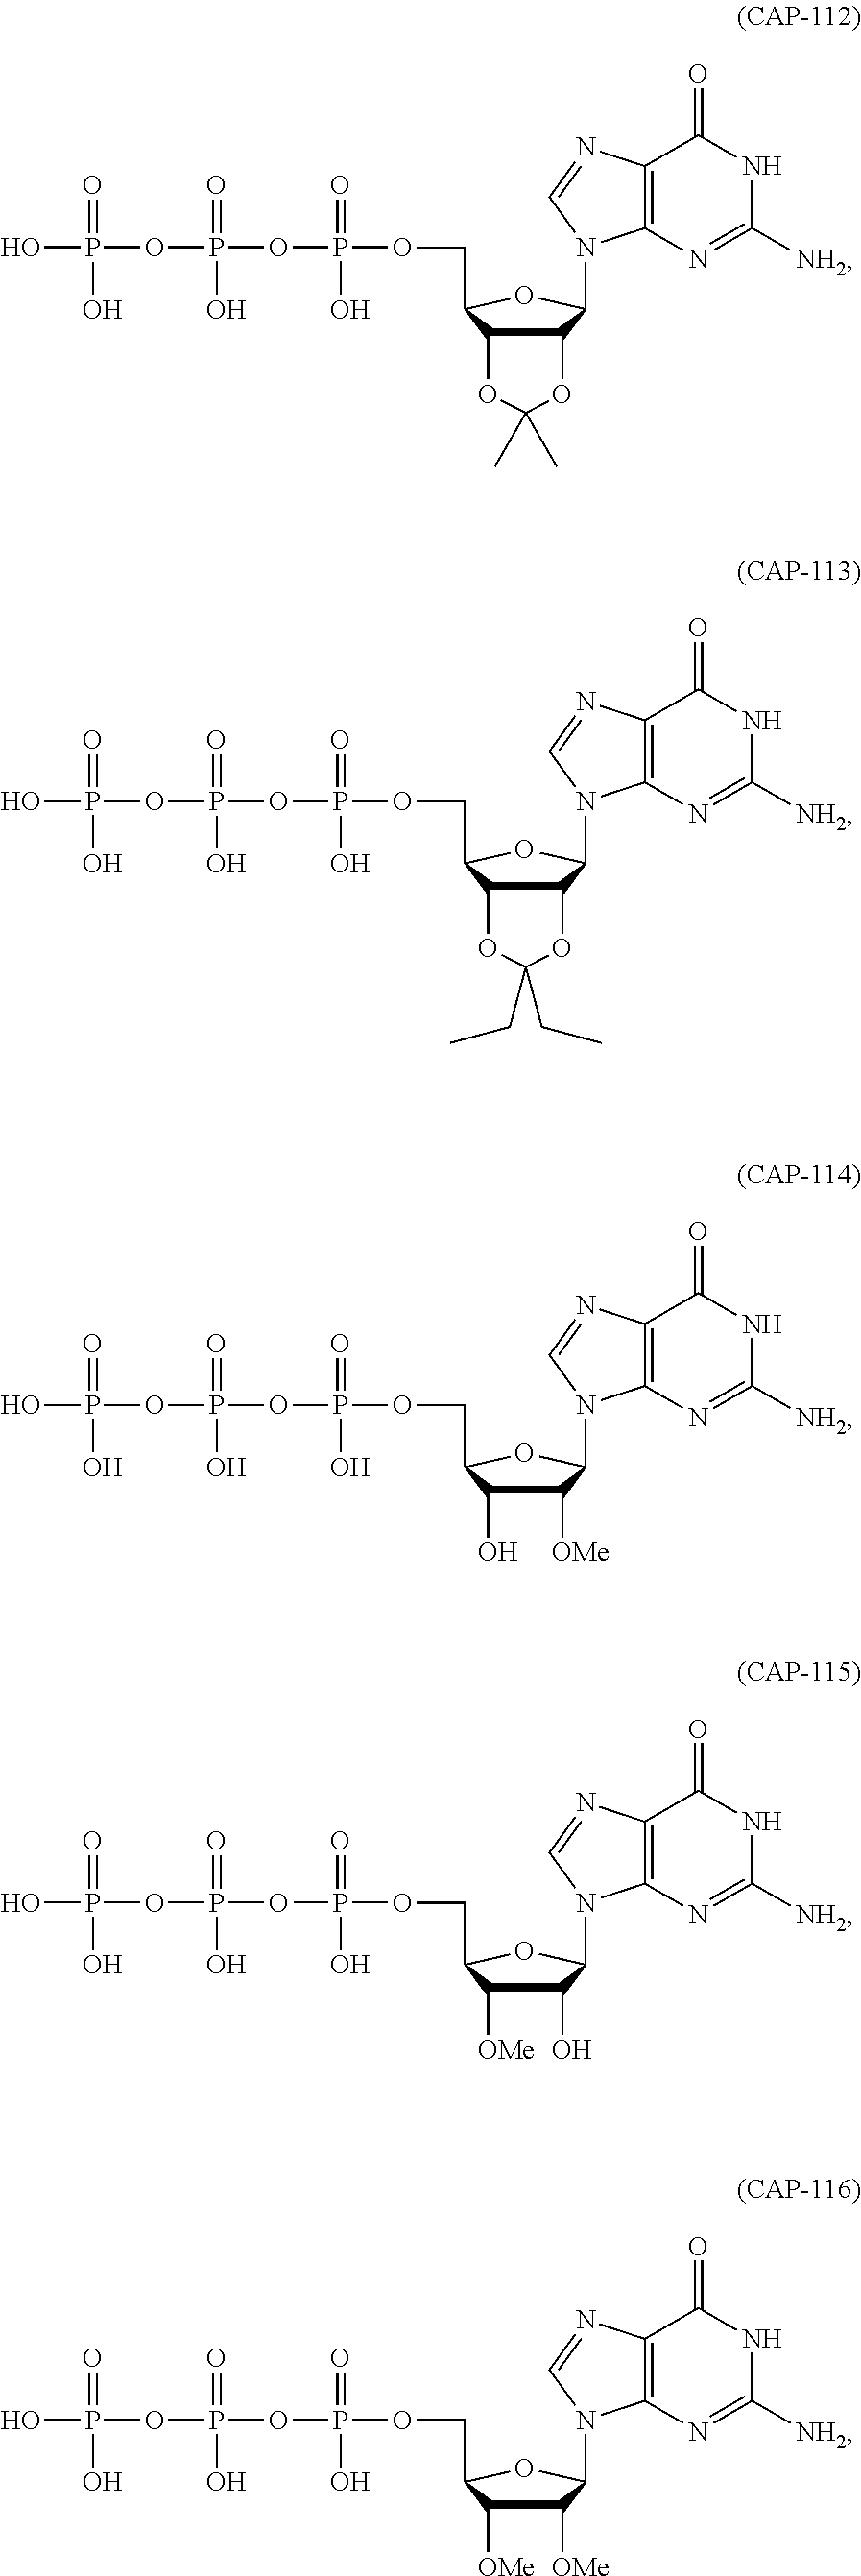 Best Prohormone 2020 US10155029B2   Terminally modified RNA   Google Patents